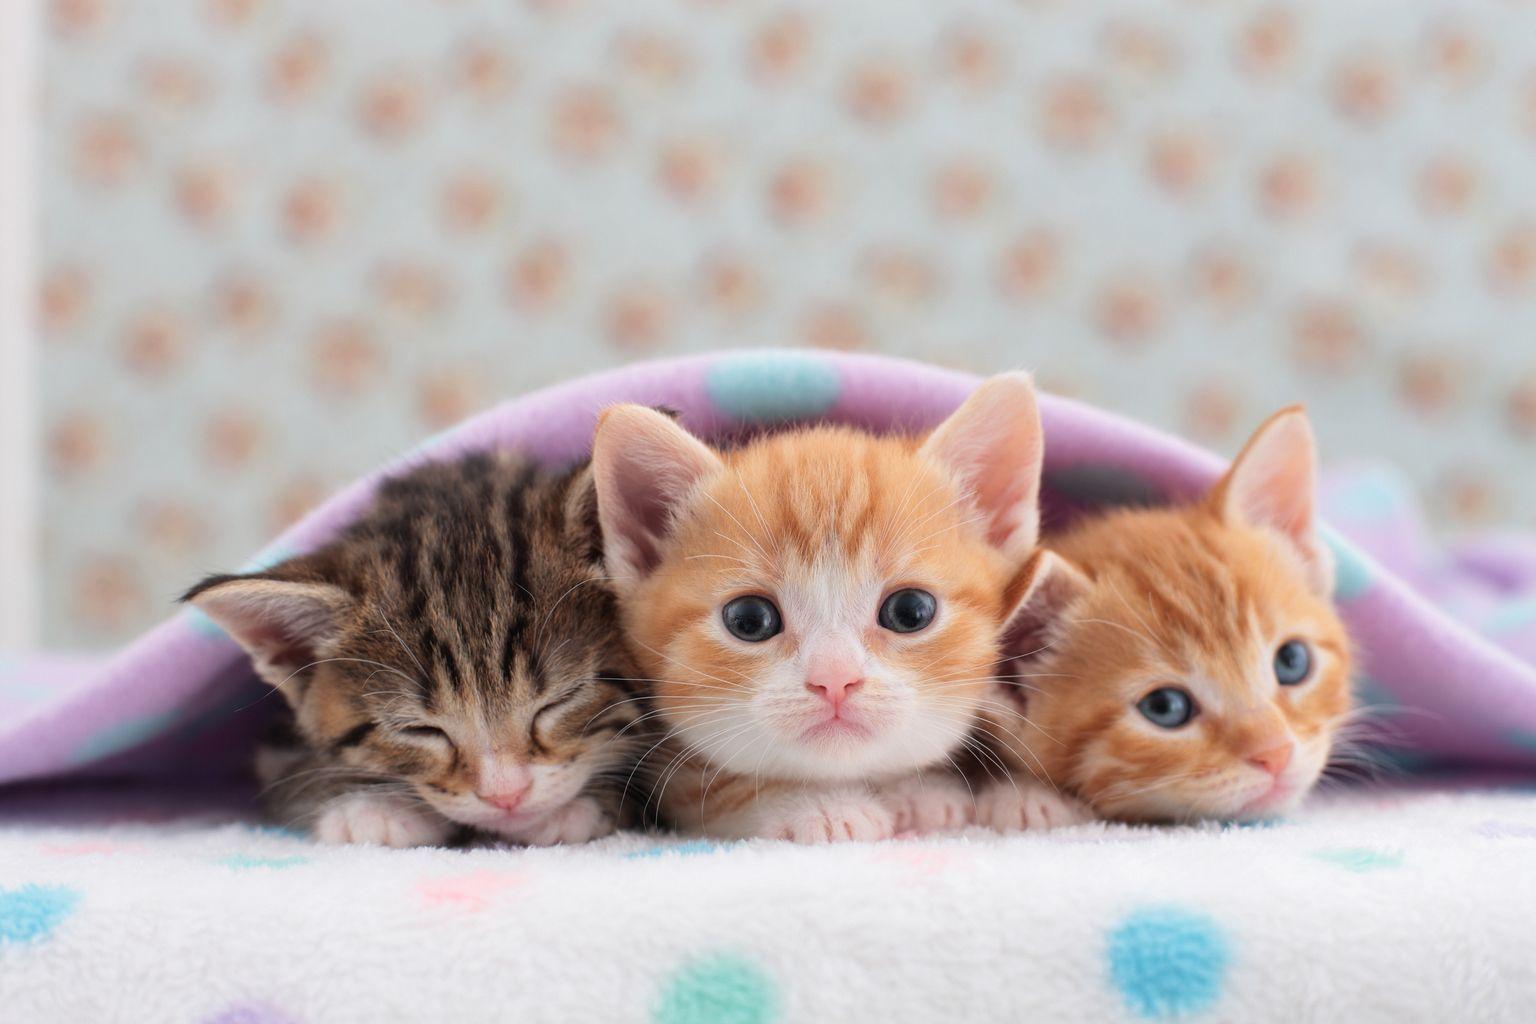 Teddy Cutecats Kittens Cutest Tiny Cats Cute Kitten Gif